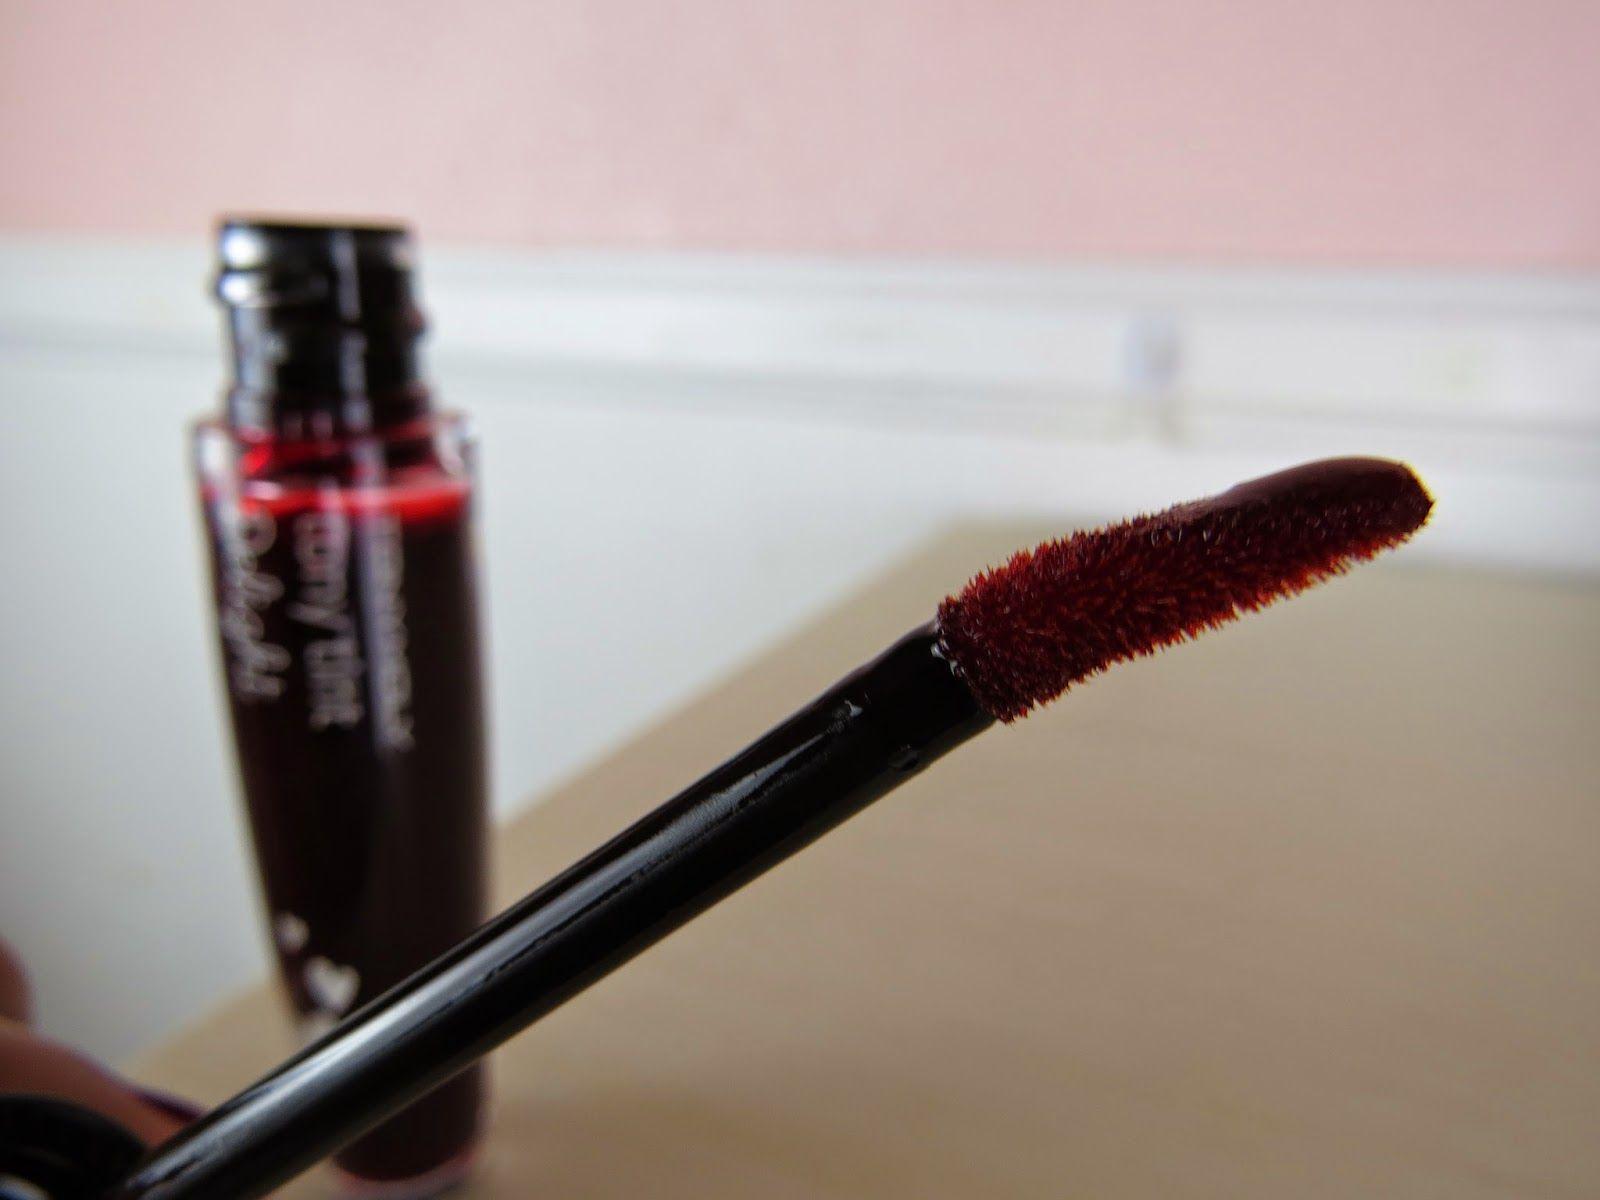 Review Tony Moly Tint Delight Lip In 02